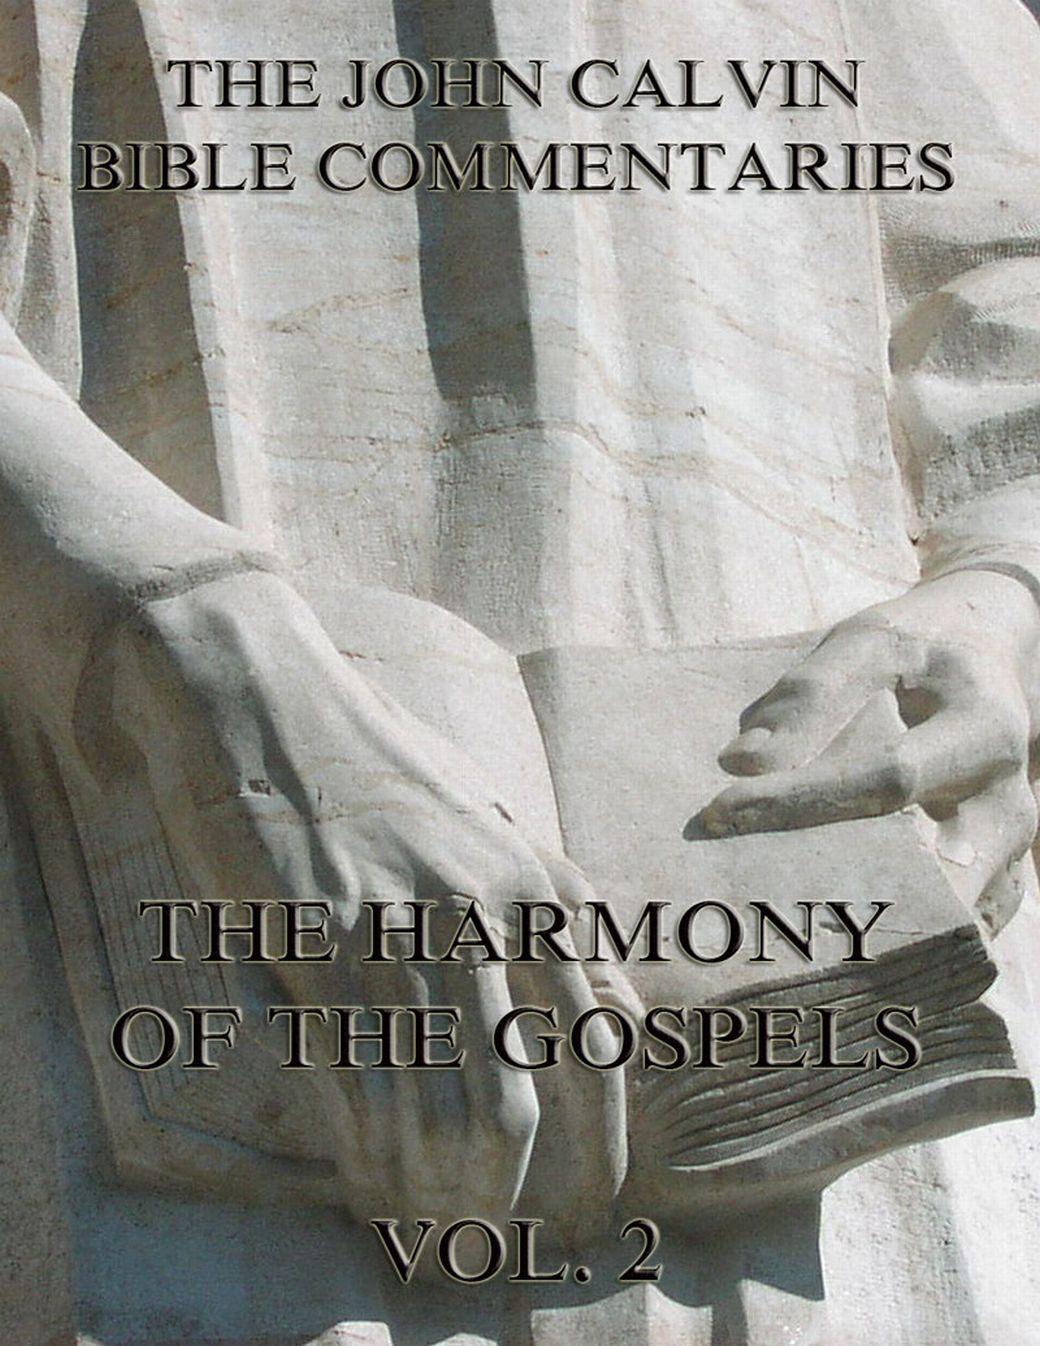 John Calvin John Calvin's Commentaries On The Harmony Of The Gospels Vol. 2 urry john after the car